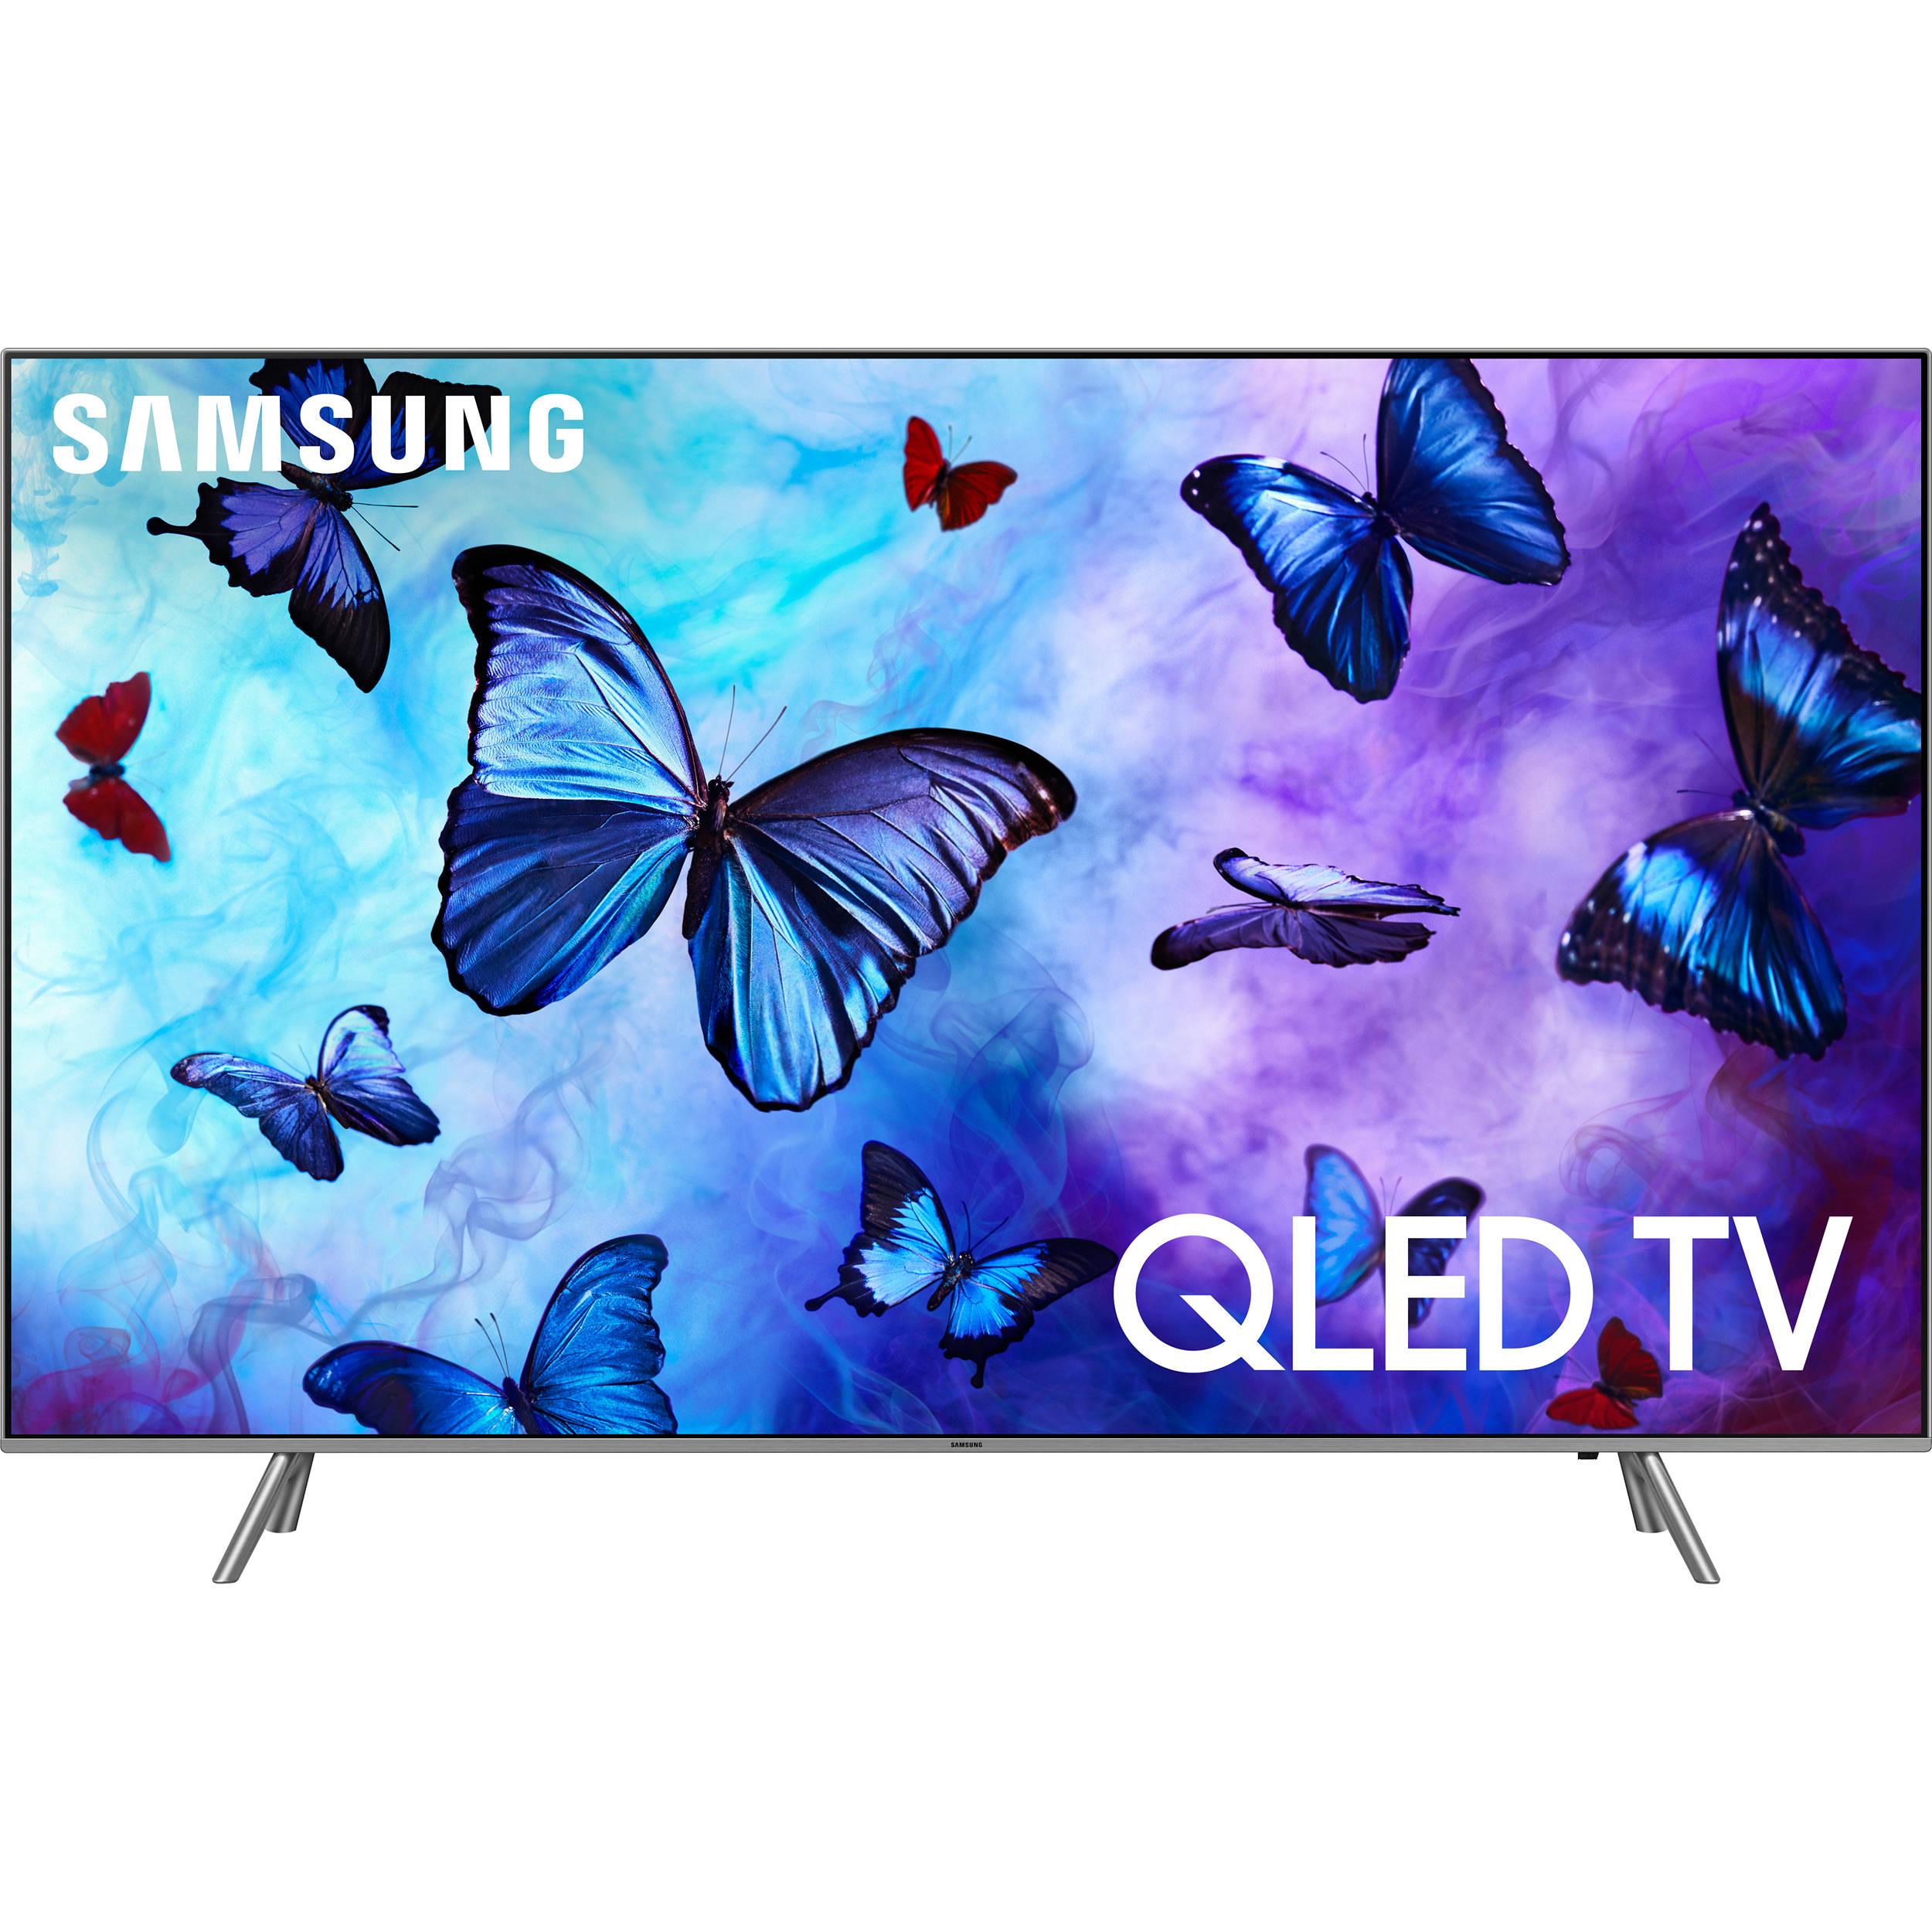 75'' Samsung QLED 4K TV Q6FN $1499.00